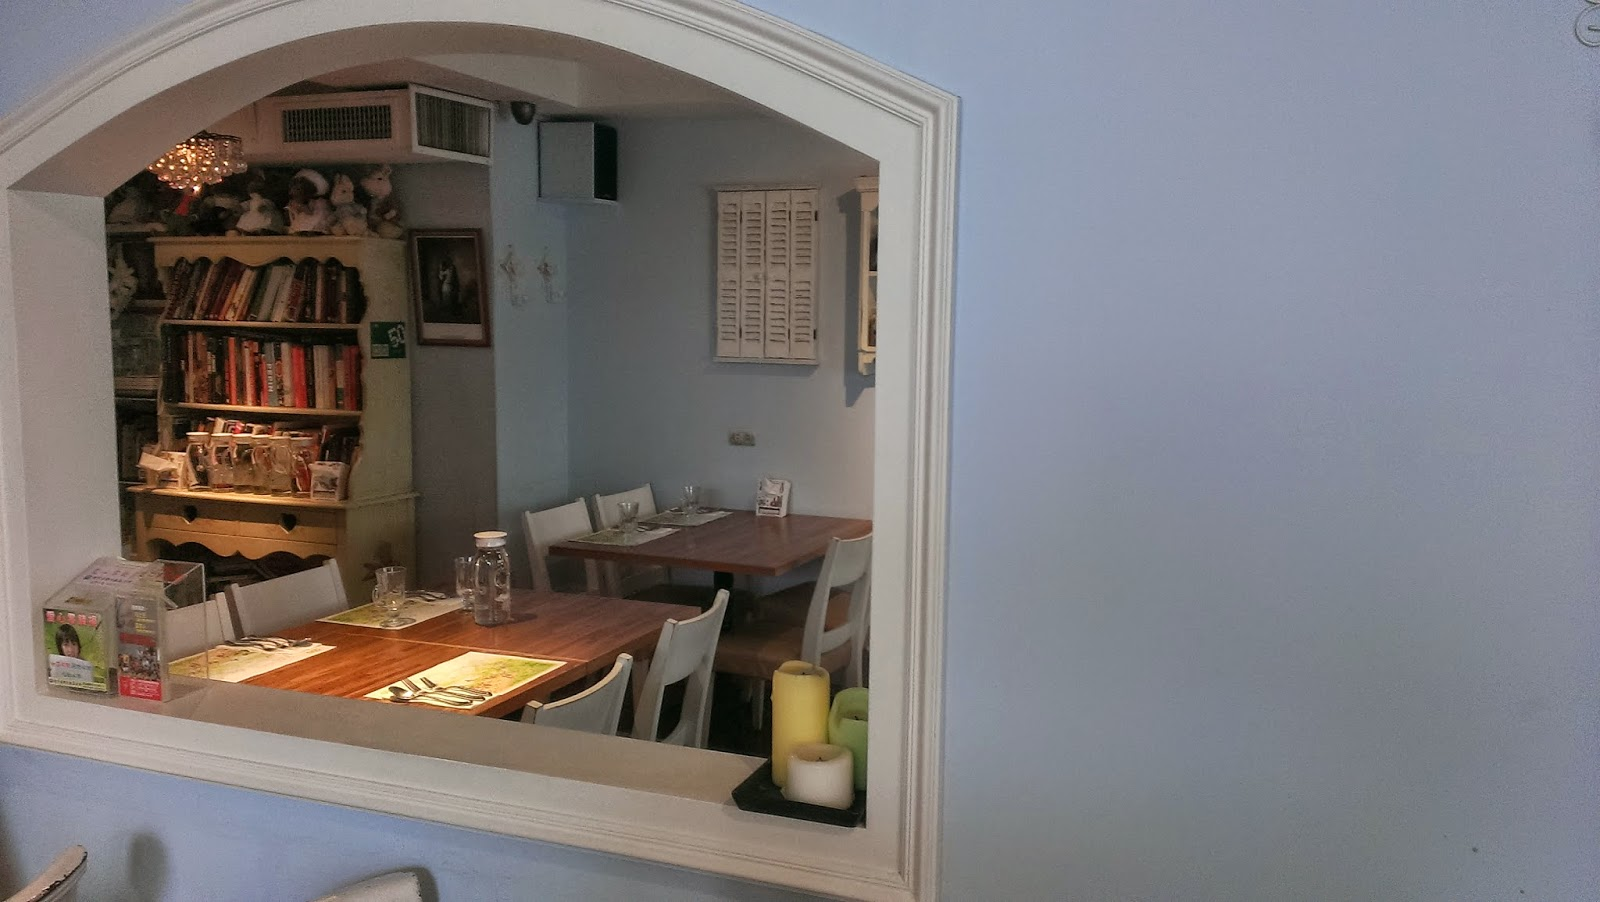 2014 09 08%2B14.17.23 - [食記] 芳庭彼得 - 義式創意無菜單料理,適合溫馨的小聚